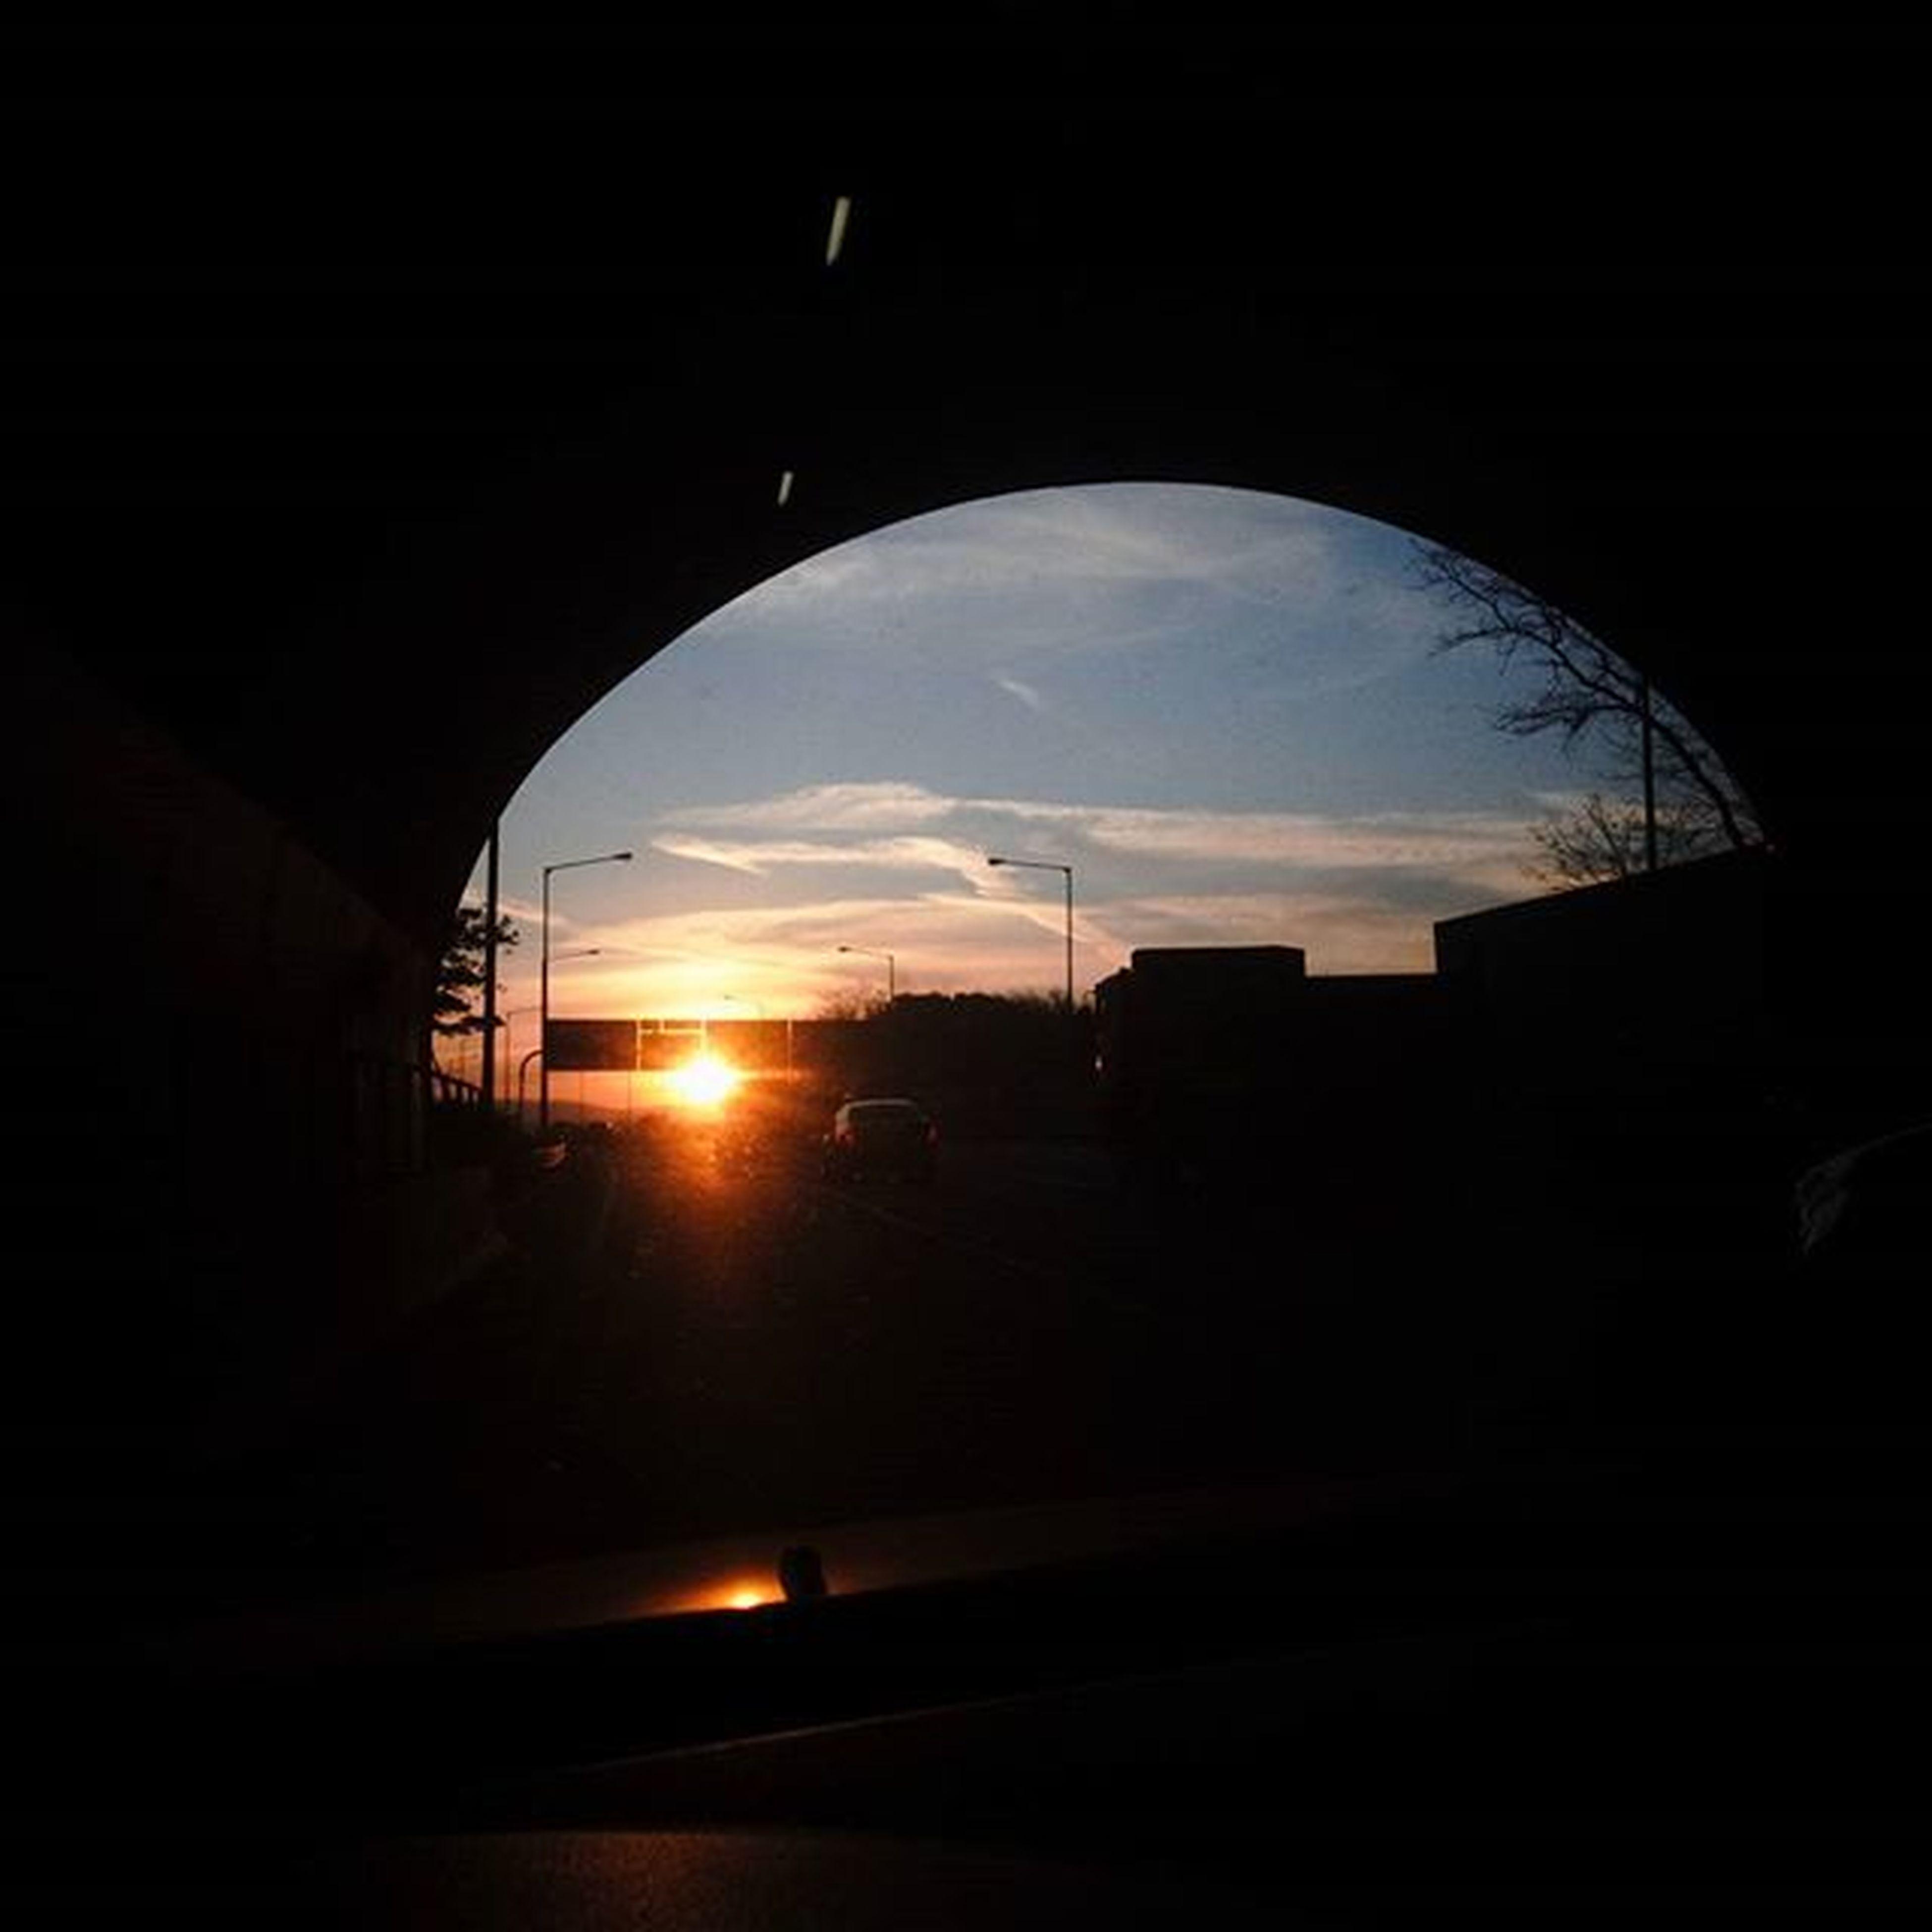 silhouette, built structure, architecture, indoors, sunset, sky, window, arch, dark, sun, building exterior, sunlight, cloud - sky, no people, road, house, building, transportation, glass - material, transparent